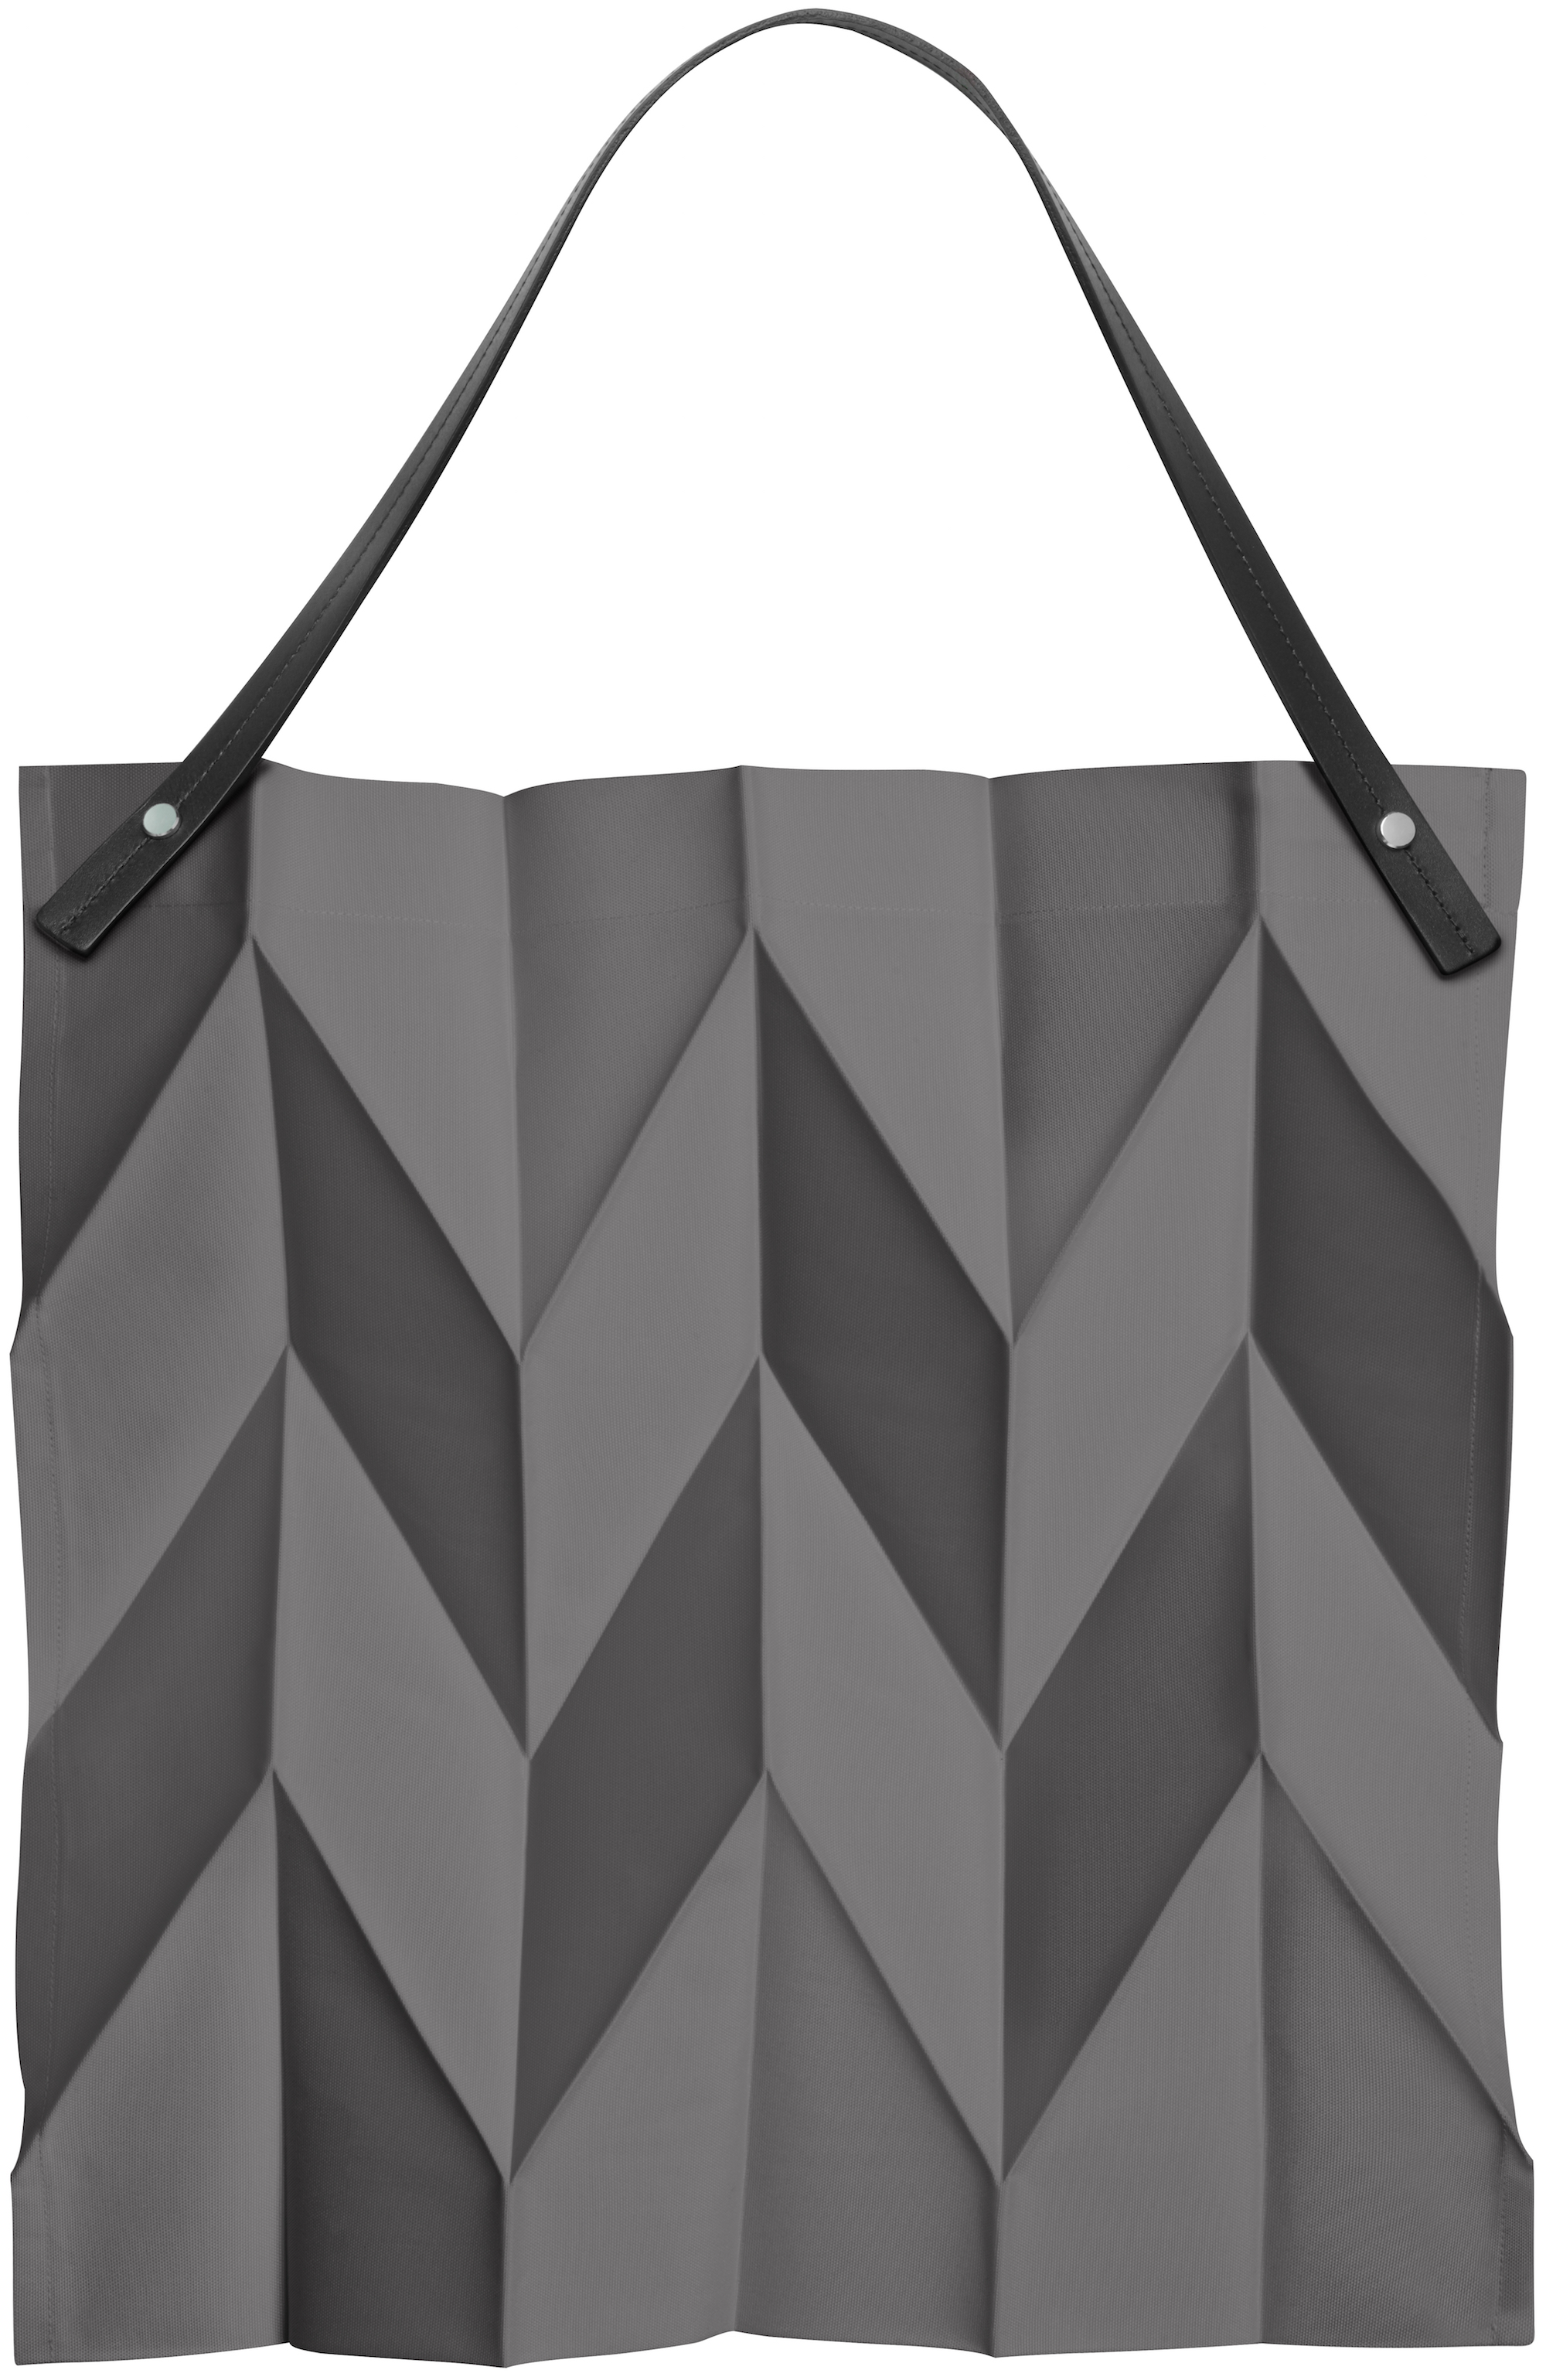 Iittala x issey miyake for Scandic design